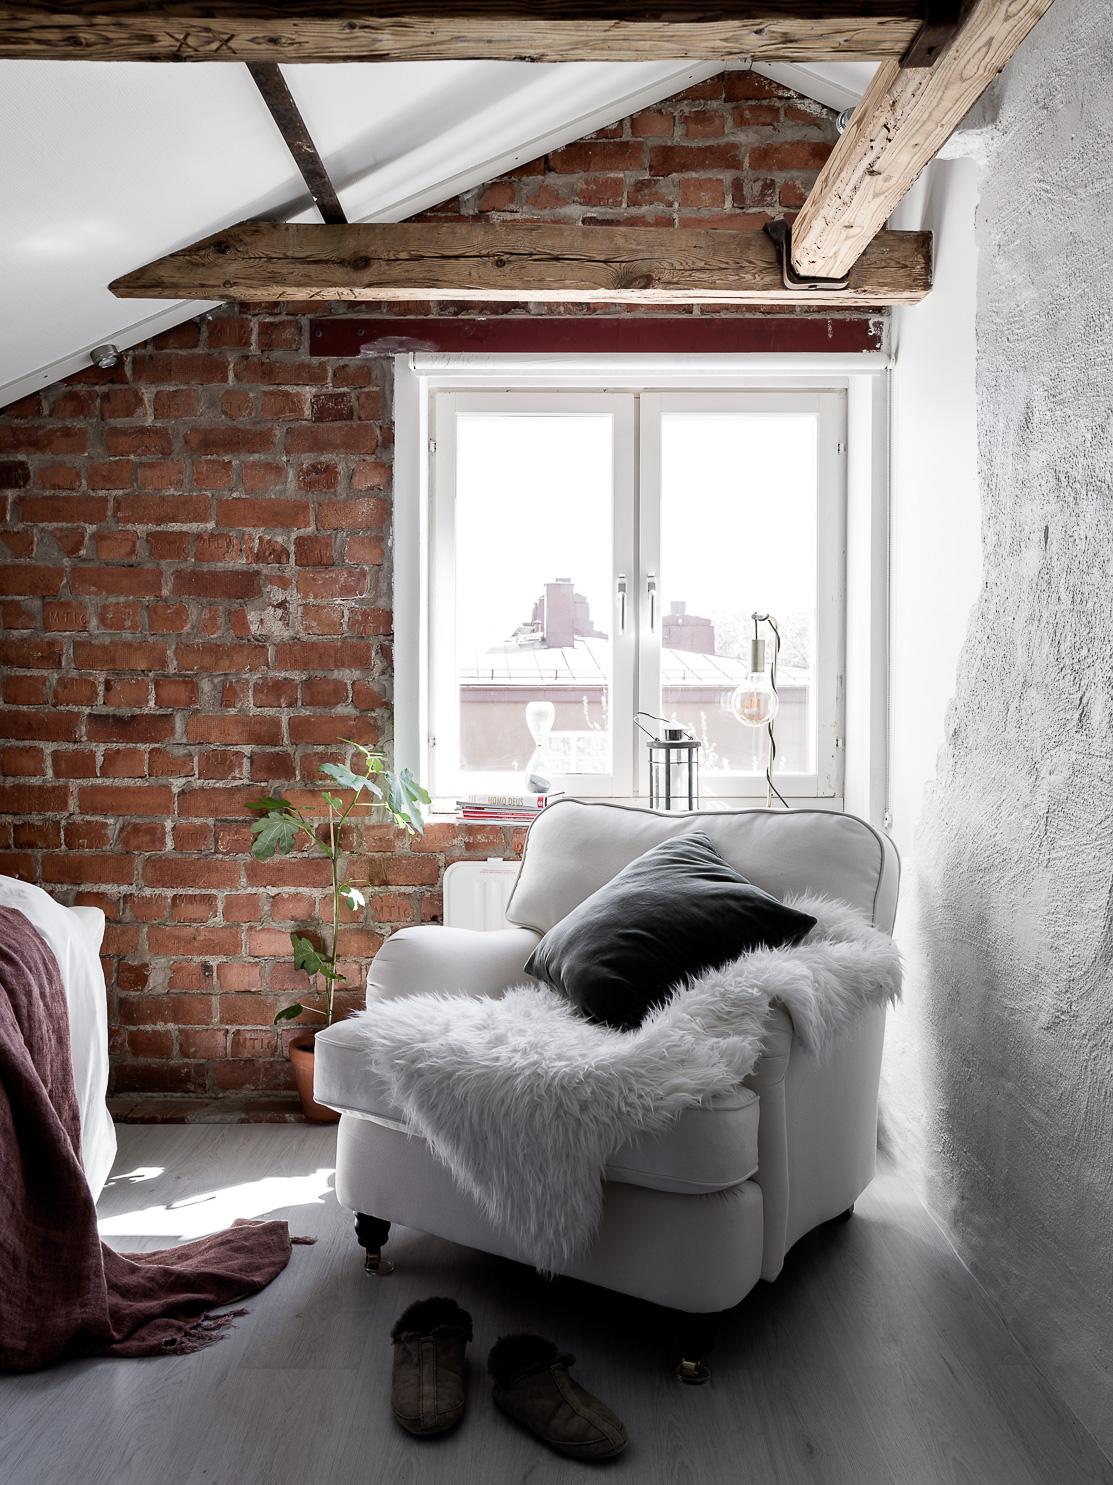 мансарда спальня окно кресло шкура балки